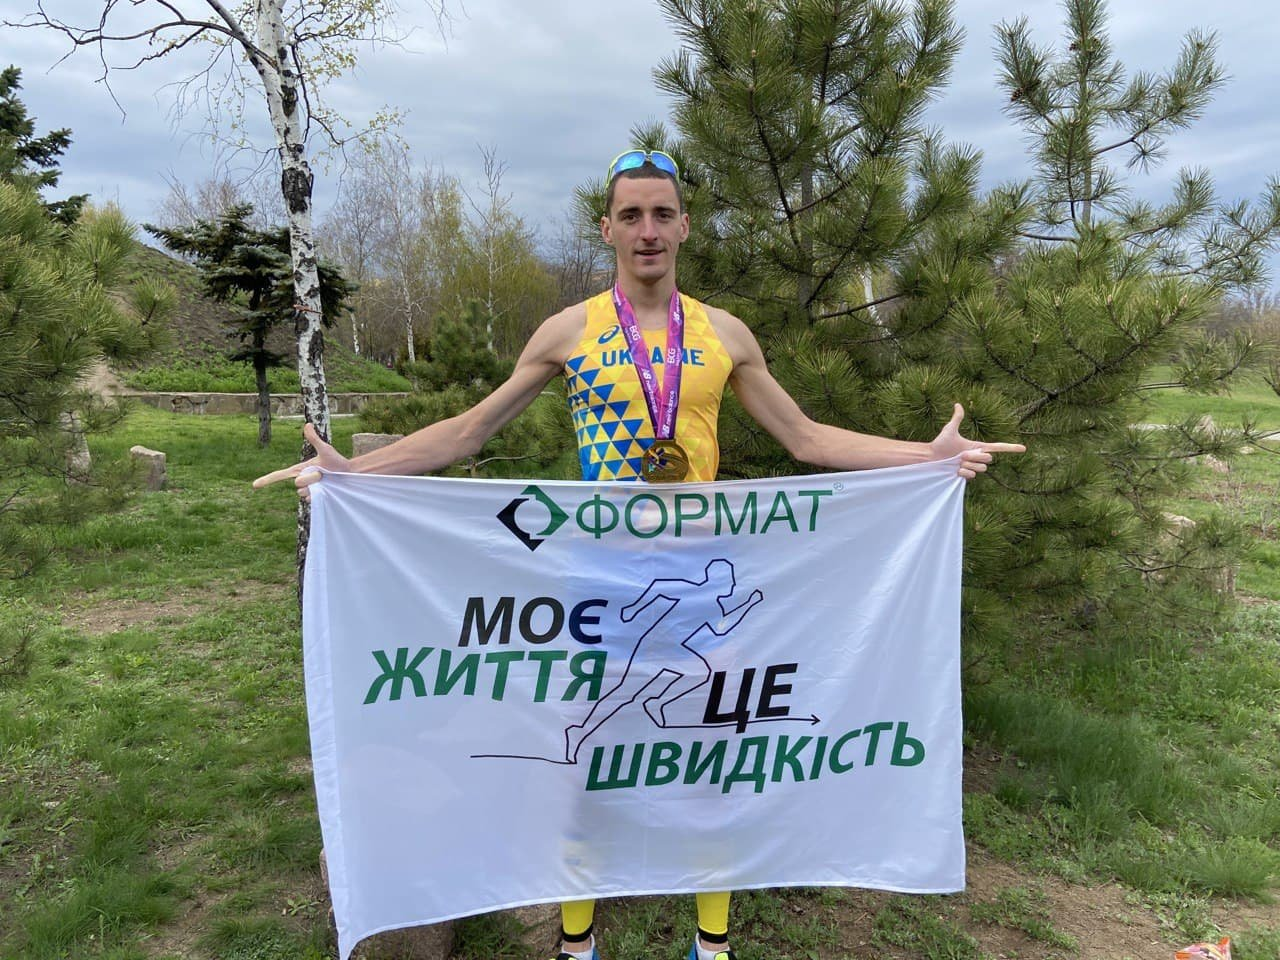 Мариуполец занял 3-е место в Международном престижном марафоне, фото-4